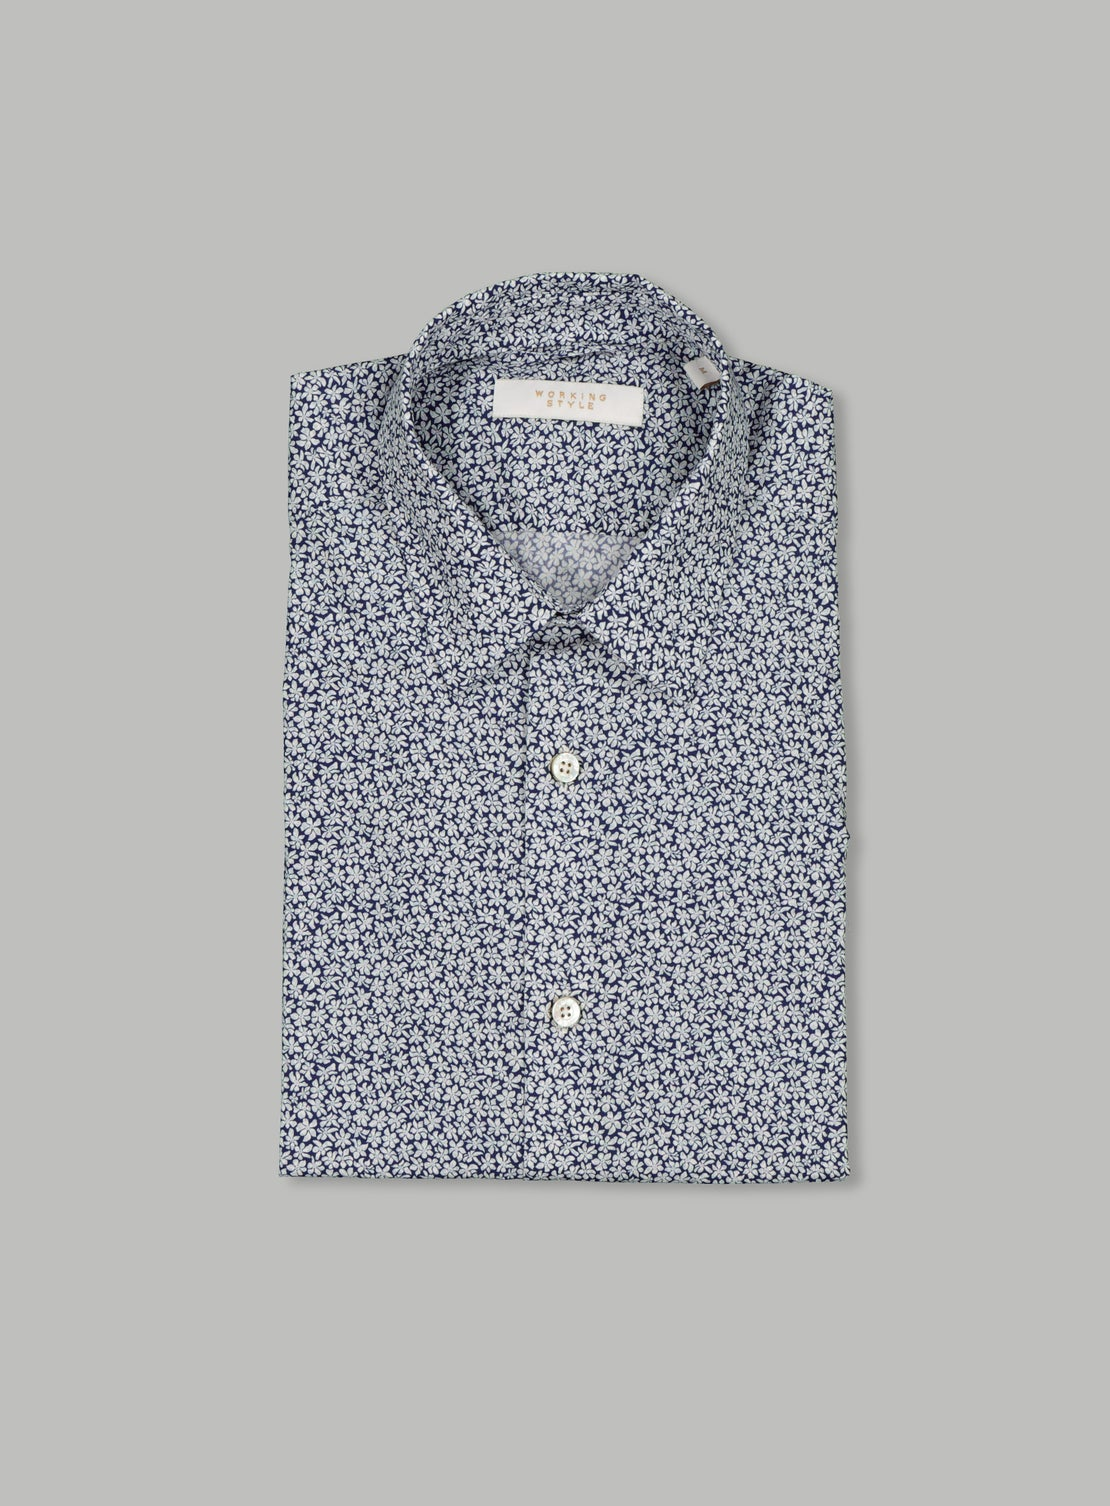 Indigo Small Floral Shirt